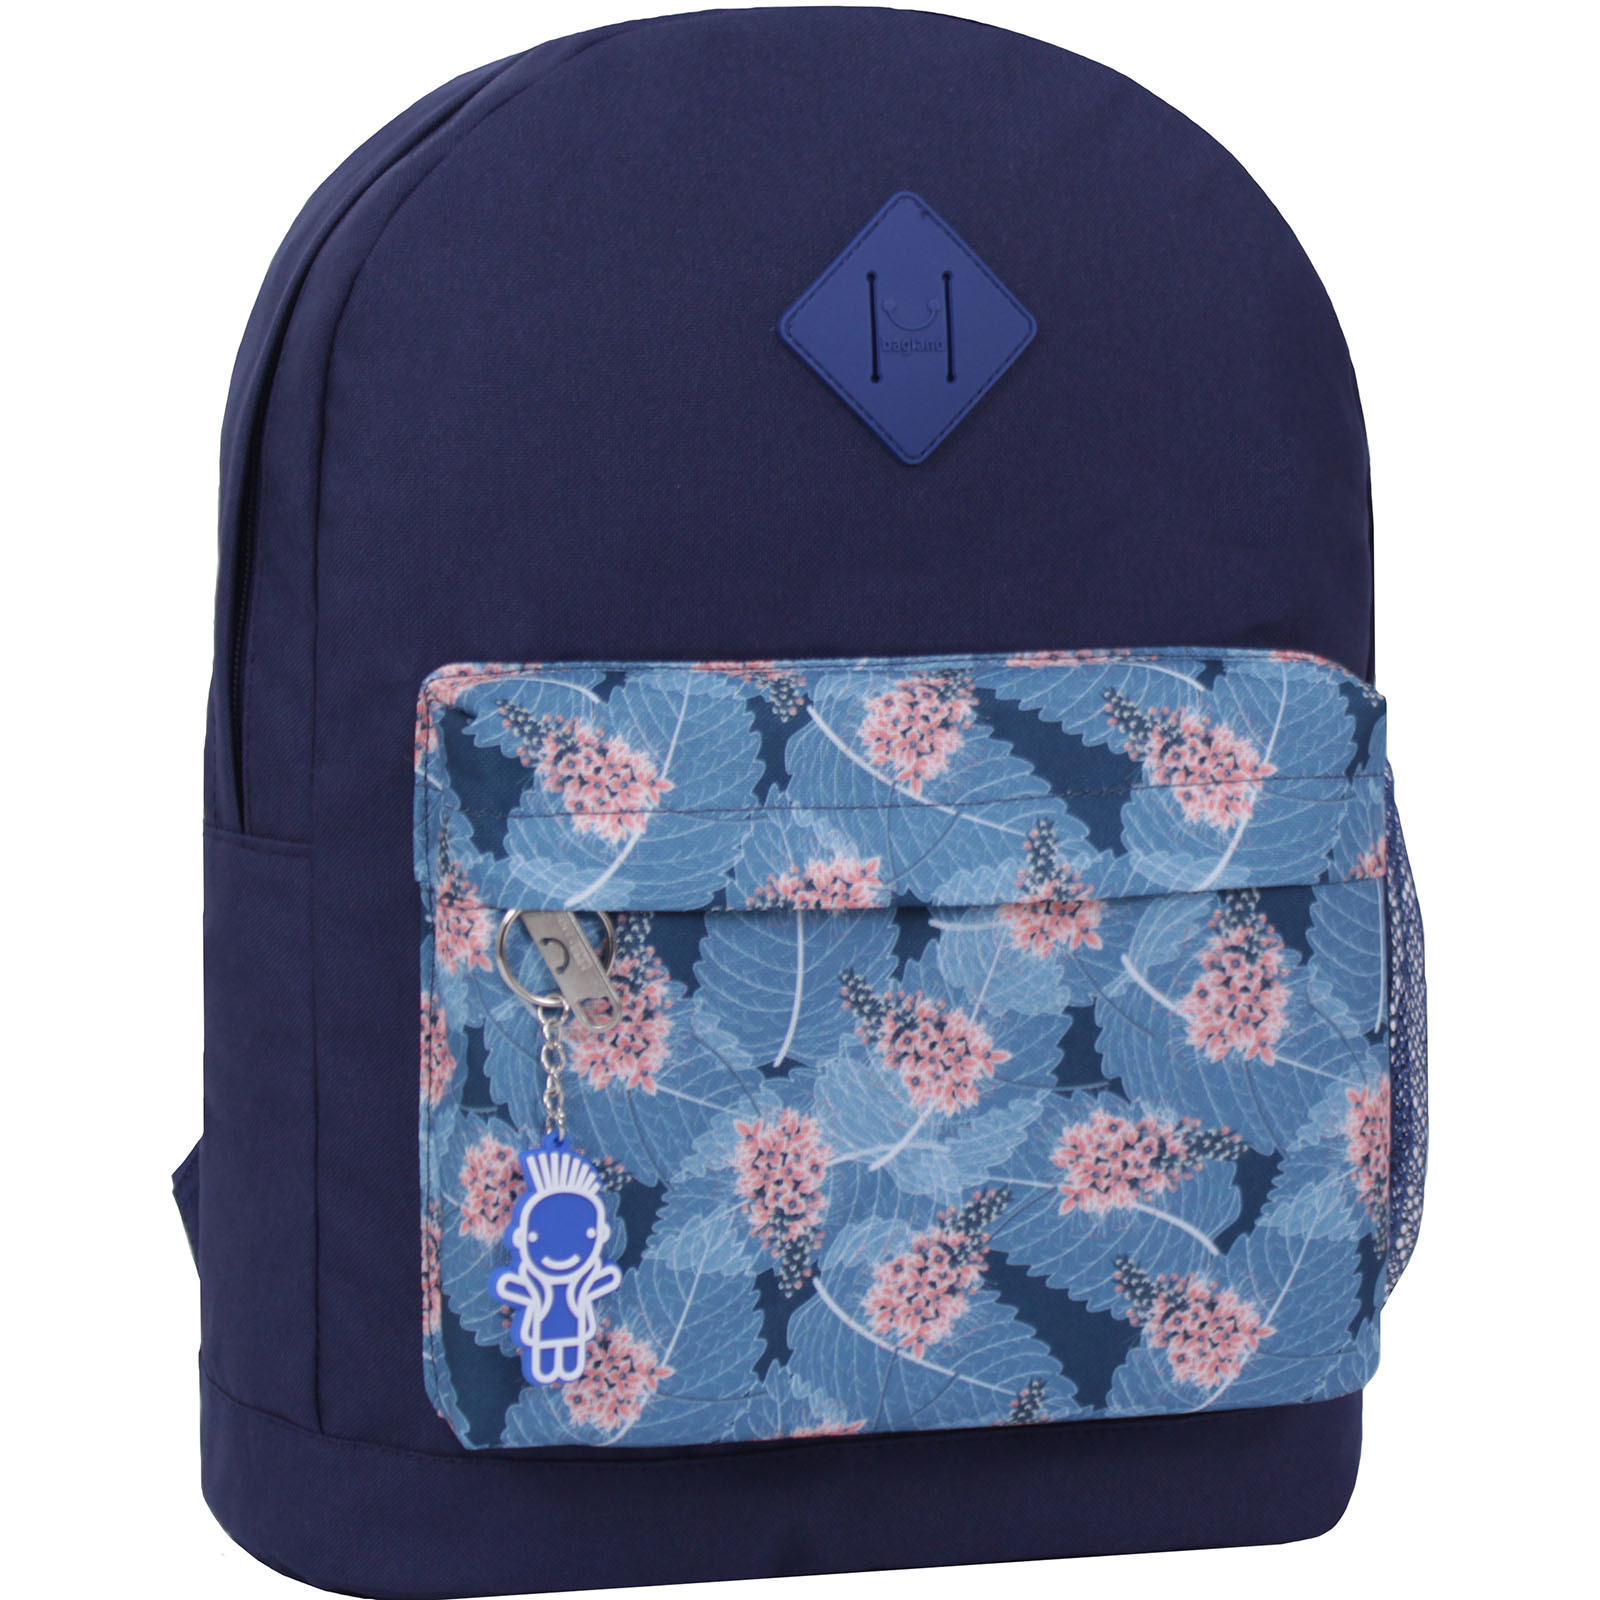 Городские рюкзаки Рюкзак Bagland Молодежный W/R 17 л. синий 479 (00533662) IMG_2276_суб.479_.JPG